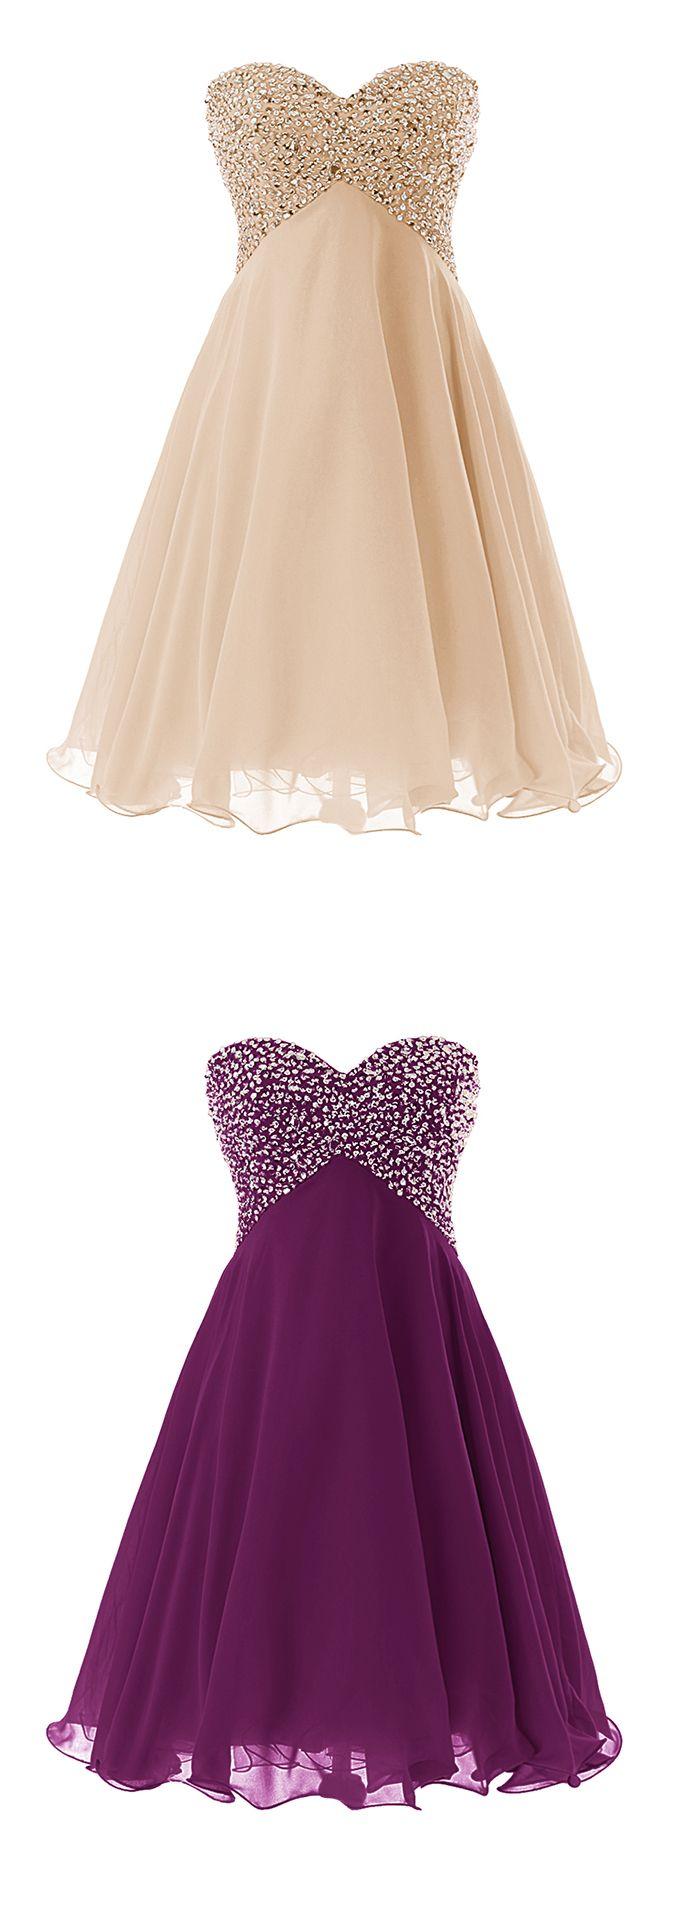 Mejores 32 imágenes de Dresses en Pinterest | Vestidos de fiesta ...